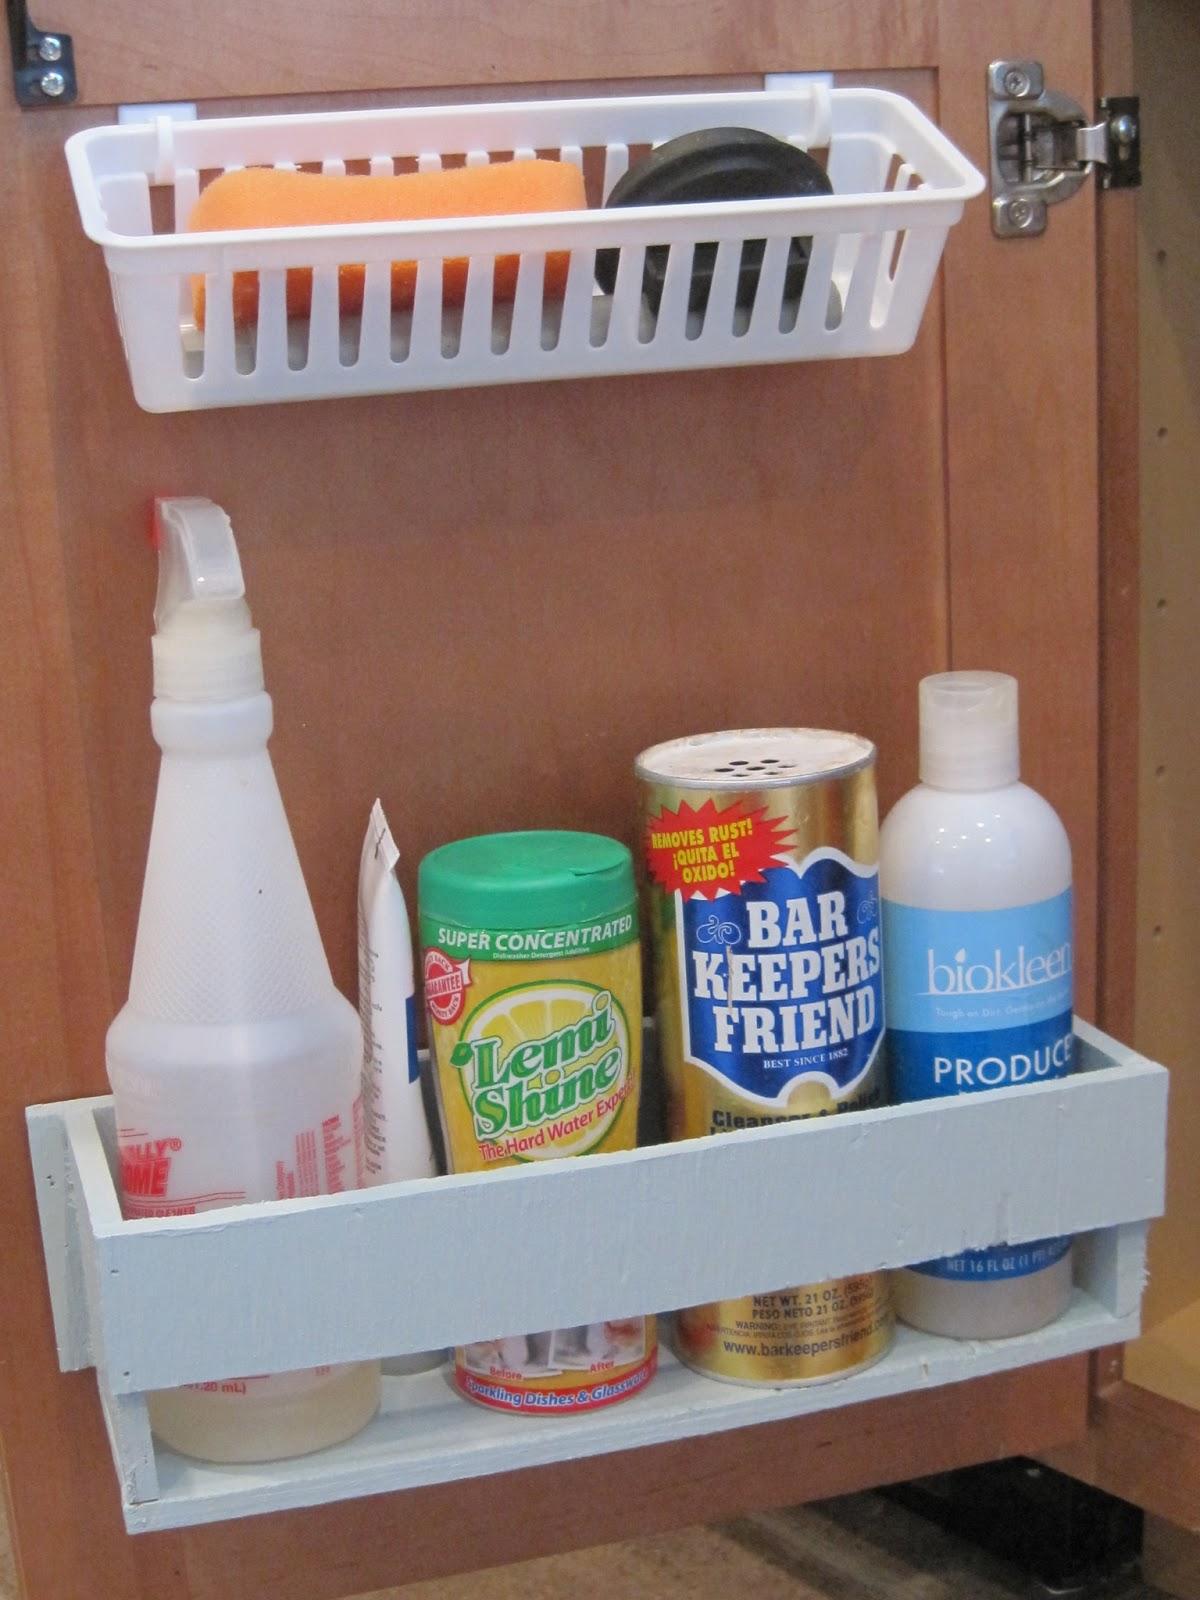 under the sink organization - bathroom and kitchen organizing tips